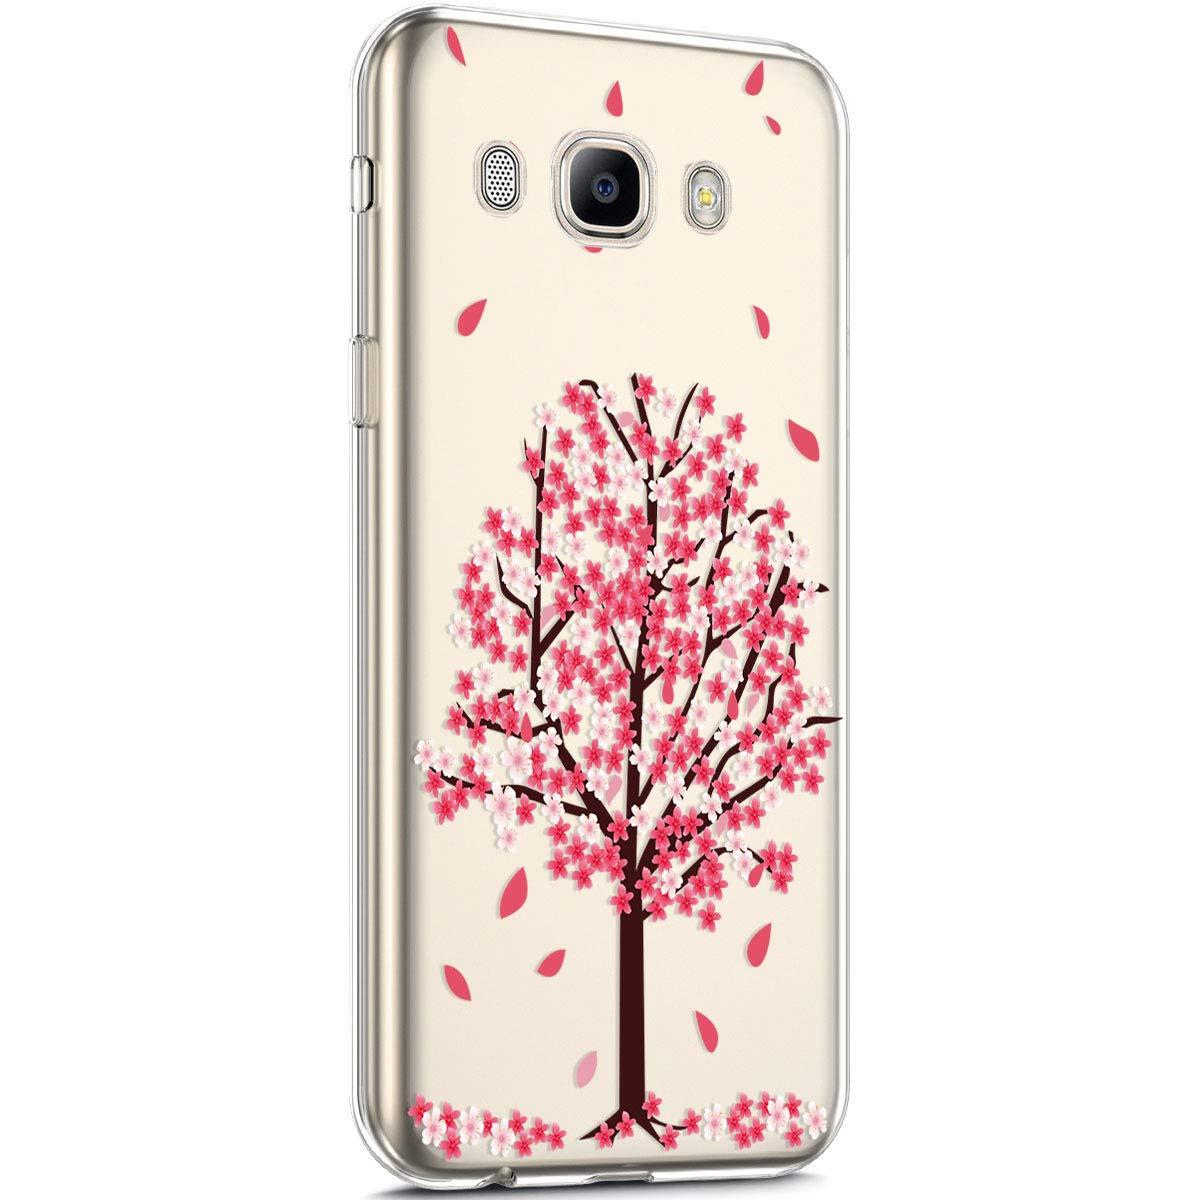 Coque pour Samsung Galaxy J7 2016 Silicone Etui,Uposao Galaxy J7 2016 Coque Transparent avec Motif Fleur Crystal Clear Case Premium Semi Hybrid Ultra Mince Slim Soft TPU Antichoc Bumper,Fleur Rose